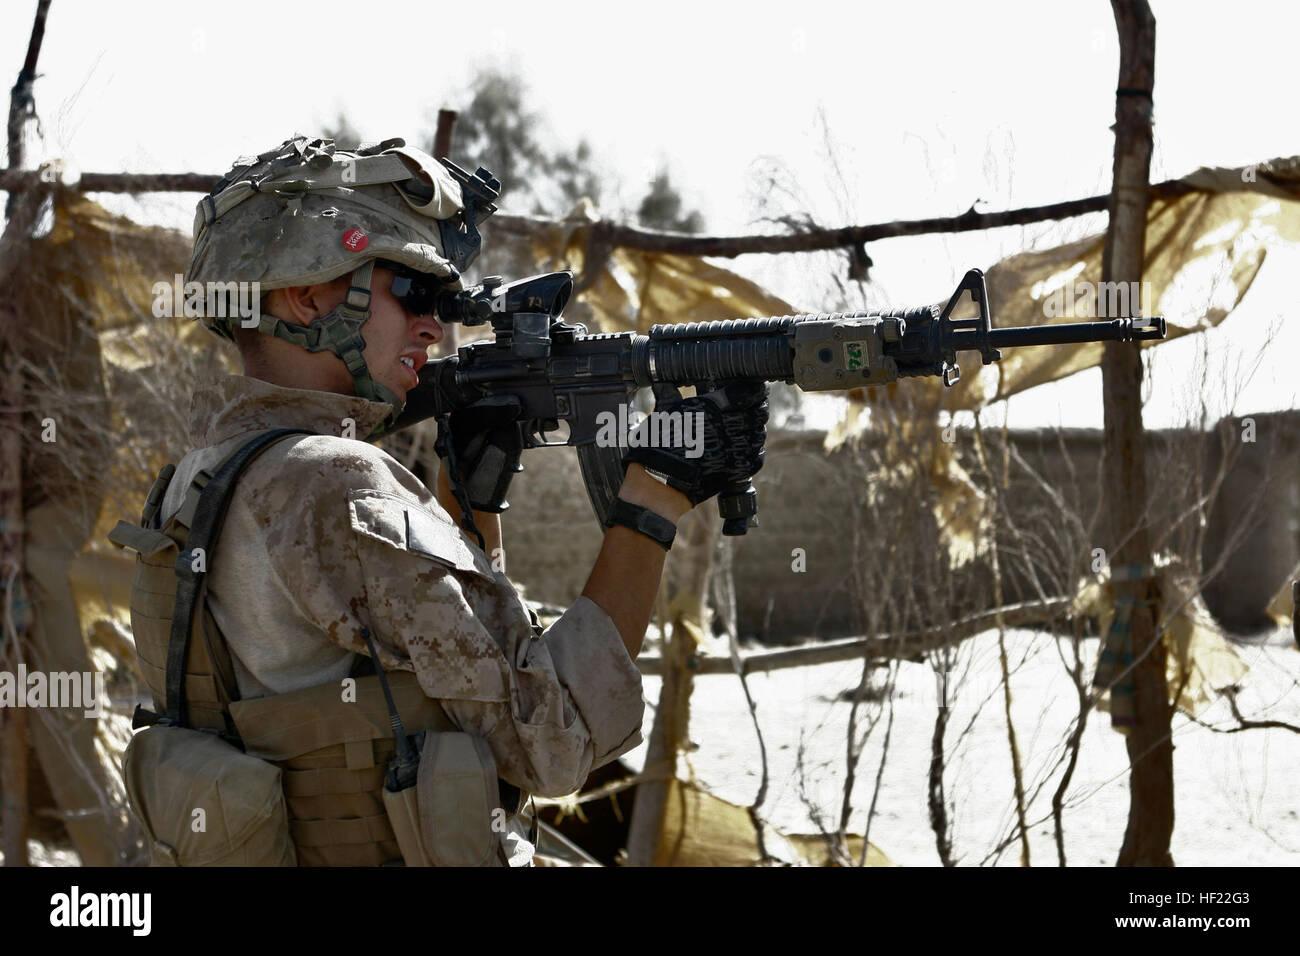 Marines With 1st Platoon Stock Photos & Marines With 1st Platoon ...